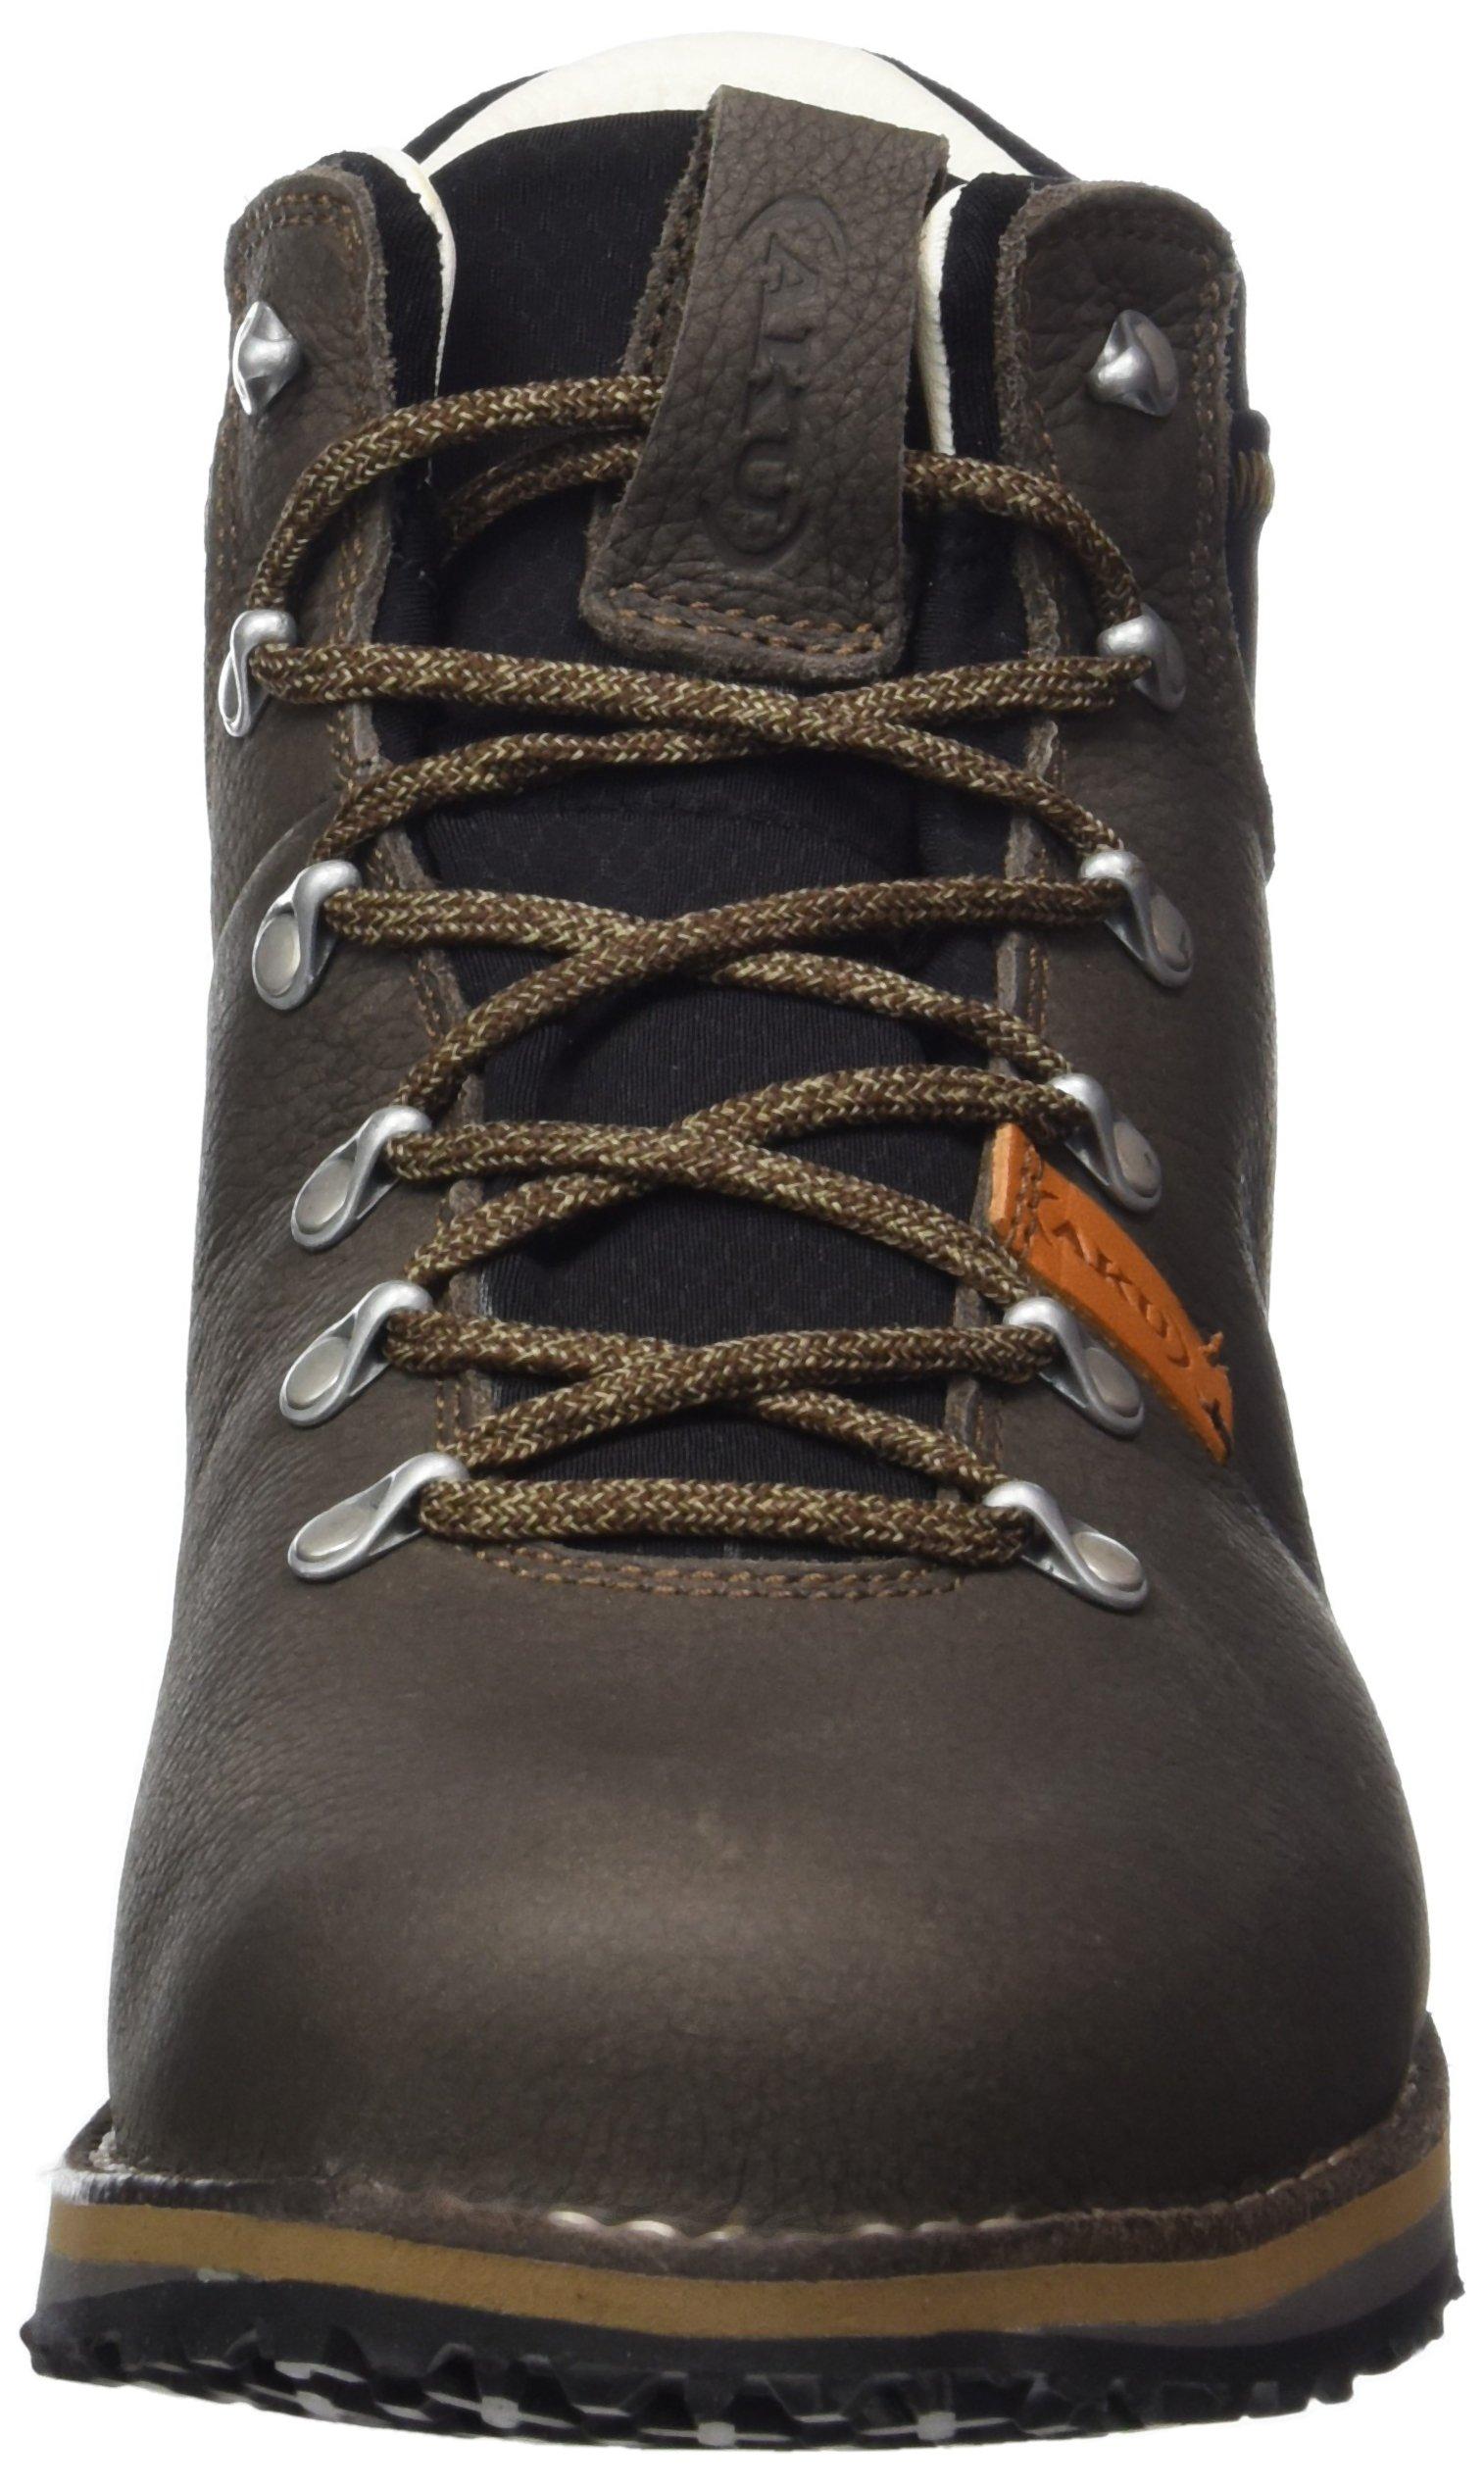 81sbL5VzJkL - AKU Unisex Adults' Badia Plus High Rise Hiking Boots